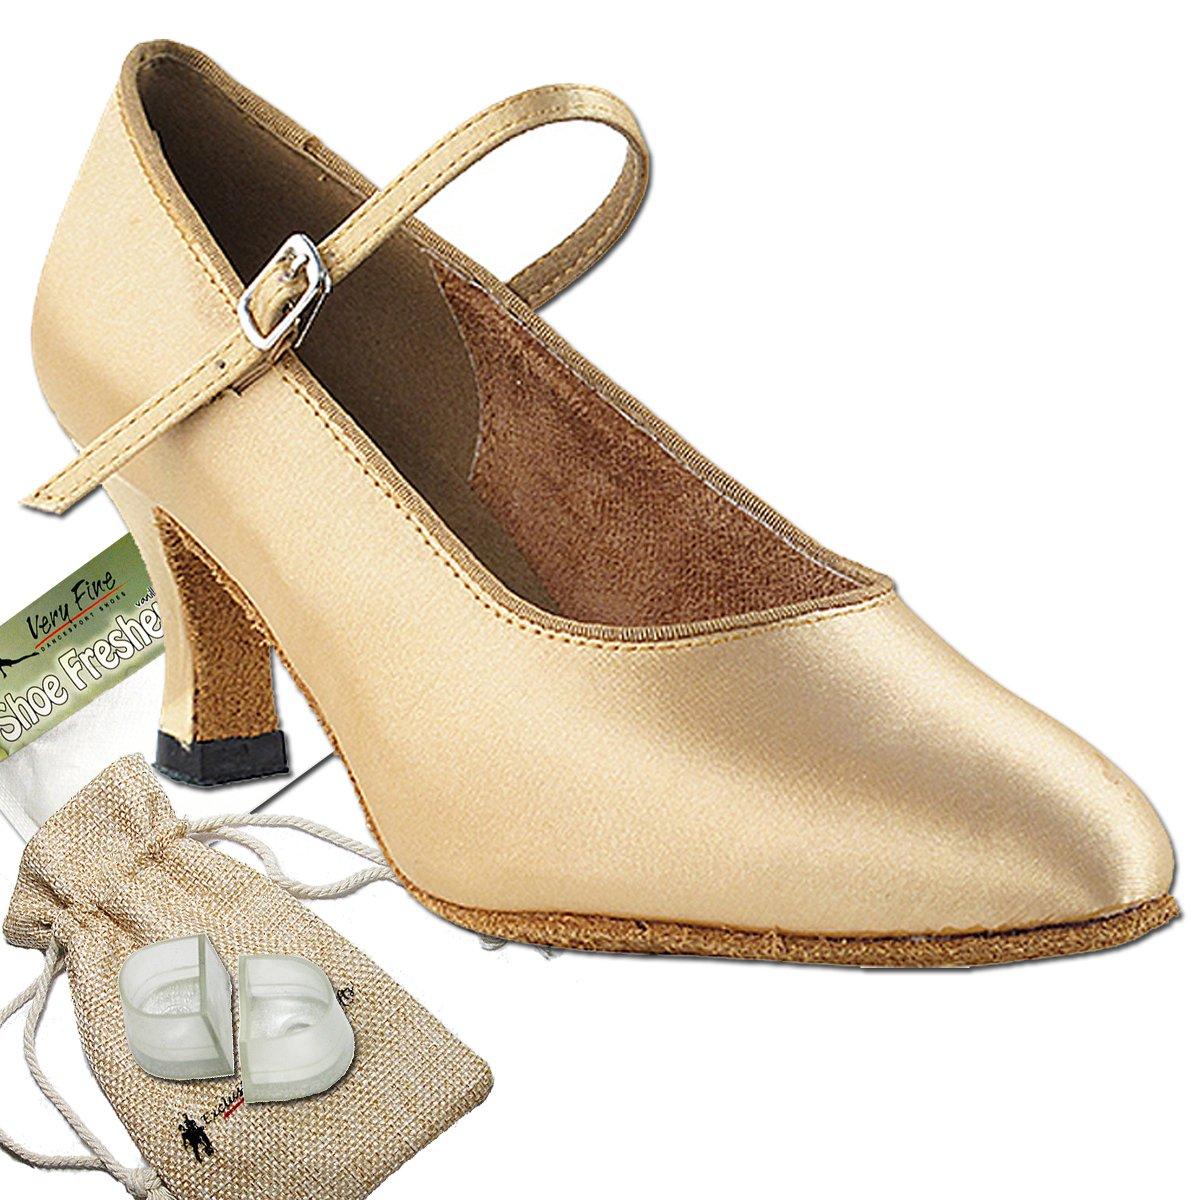 [Very Fine Shoes] レディース B00BZIZVM8 Light brown satin 8.5 (B,M) US